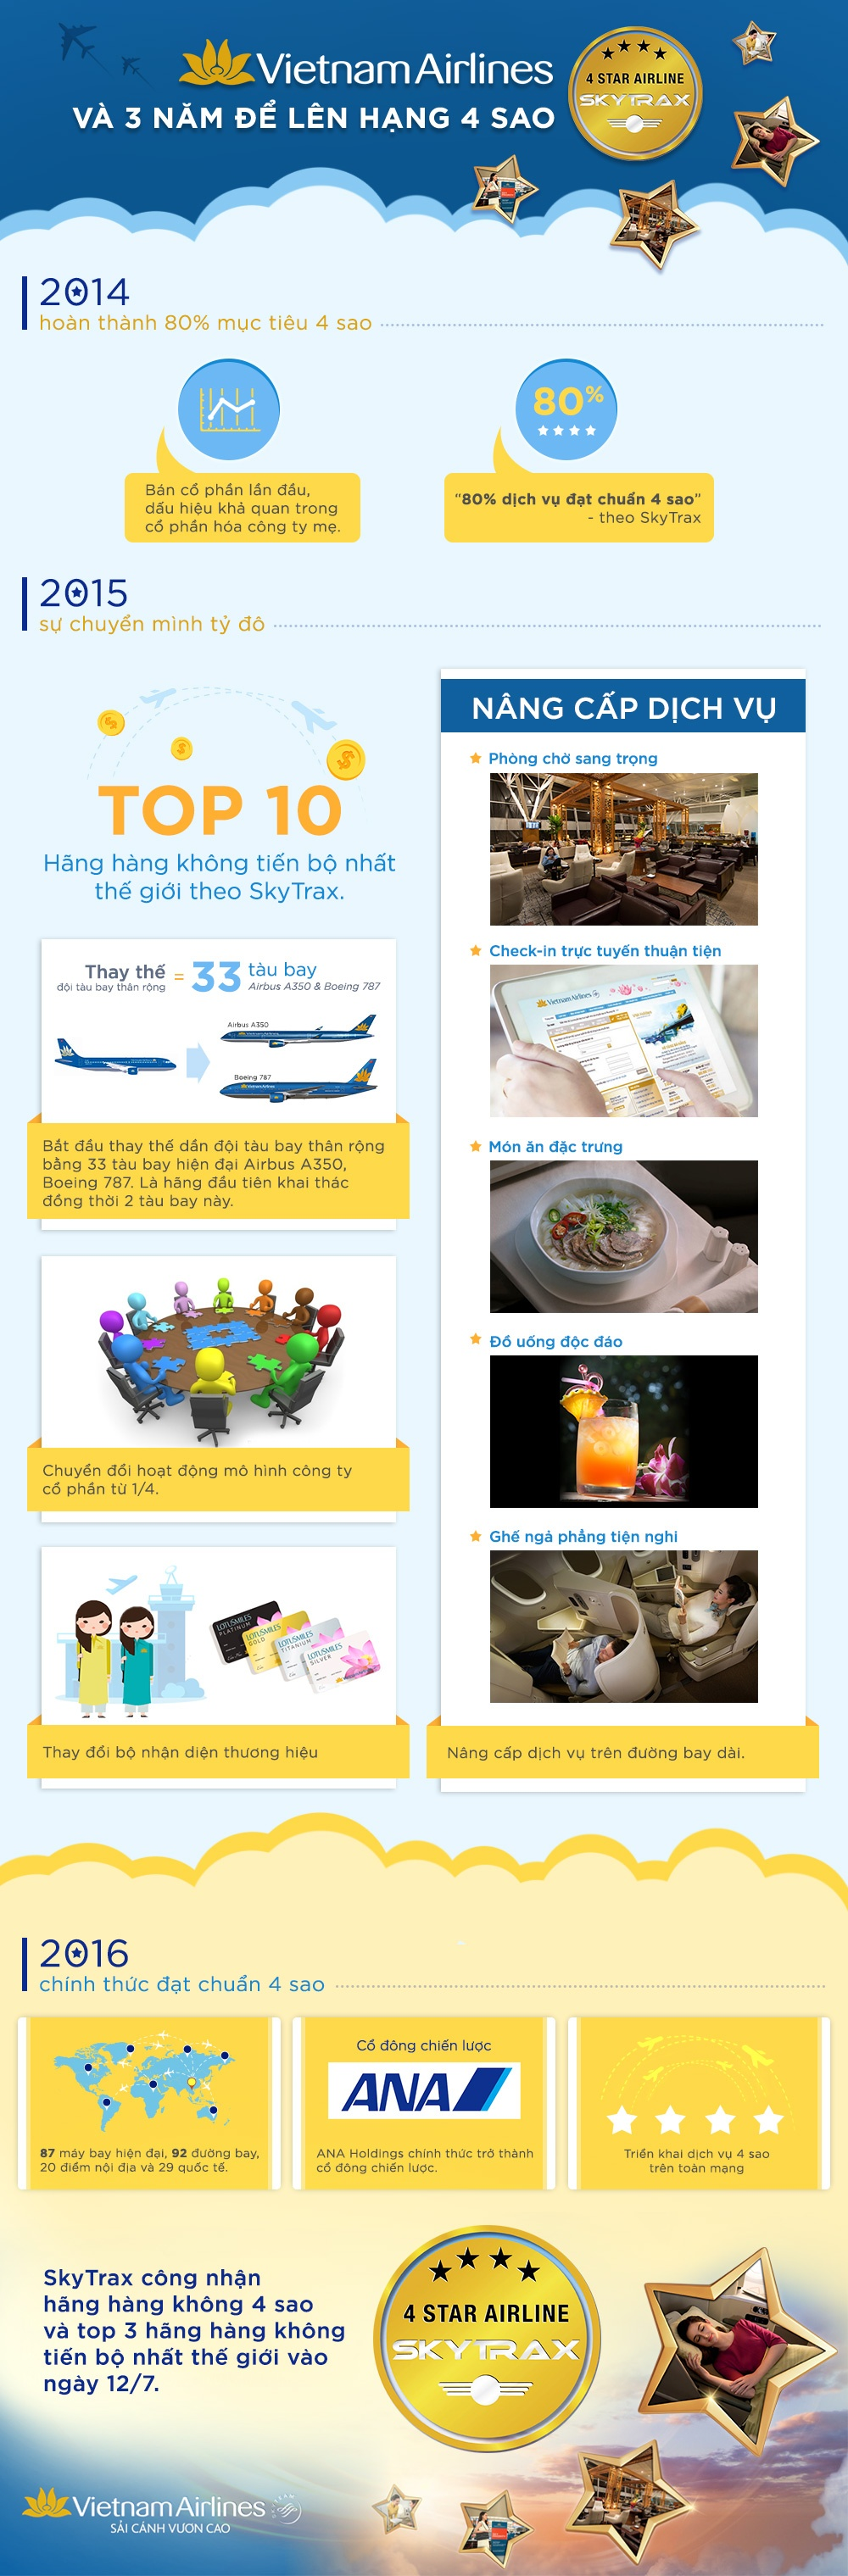 Vietnam Airlines va 3 nam de len hang 4 sao hinh anh 1